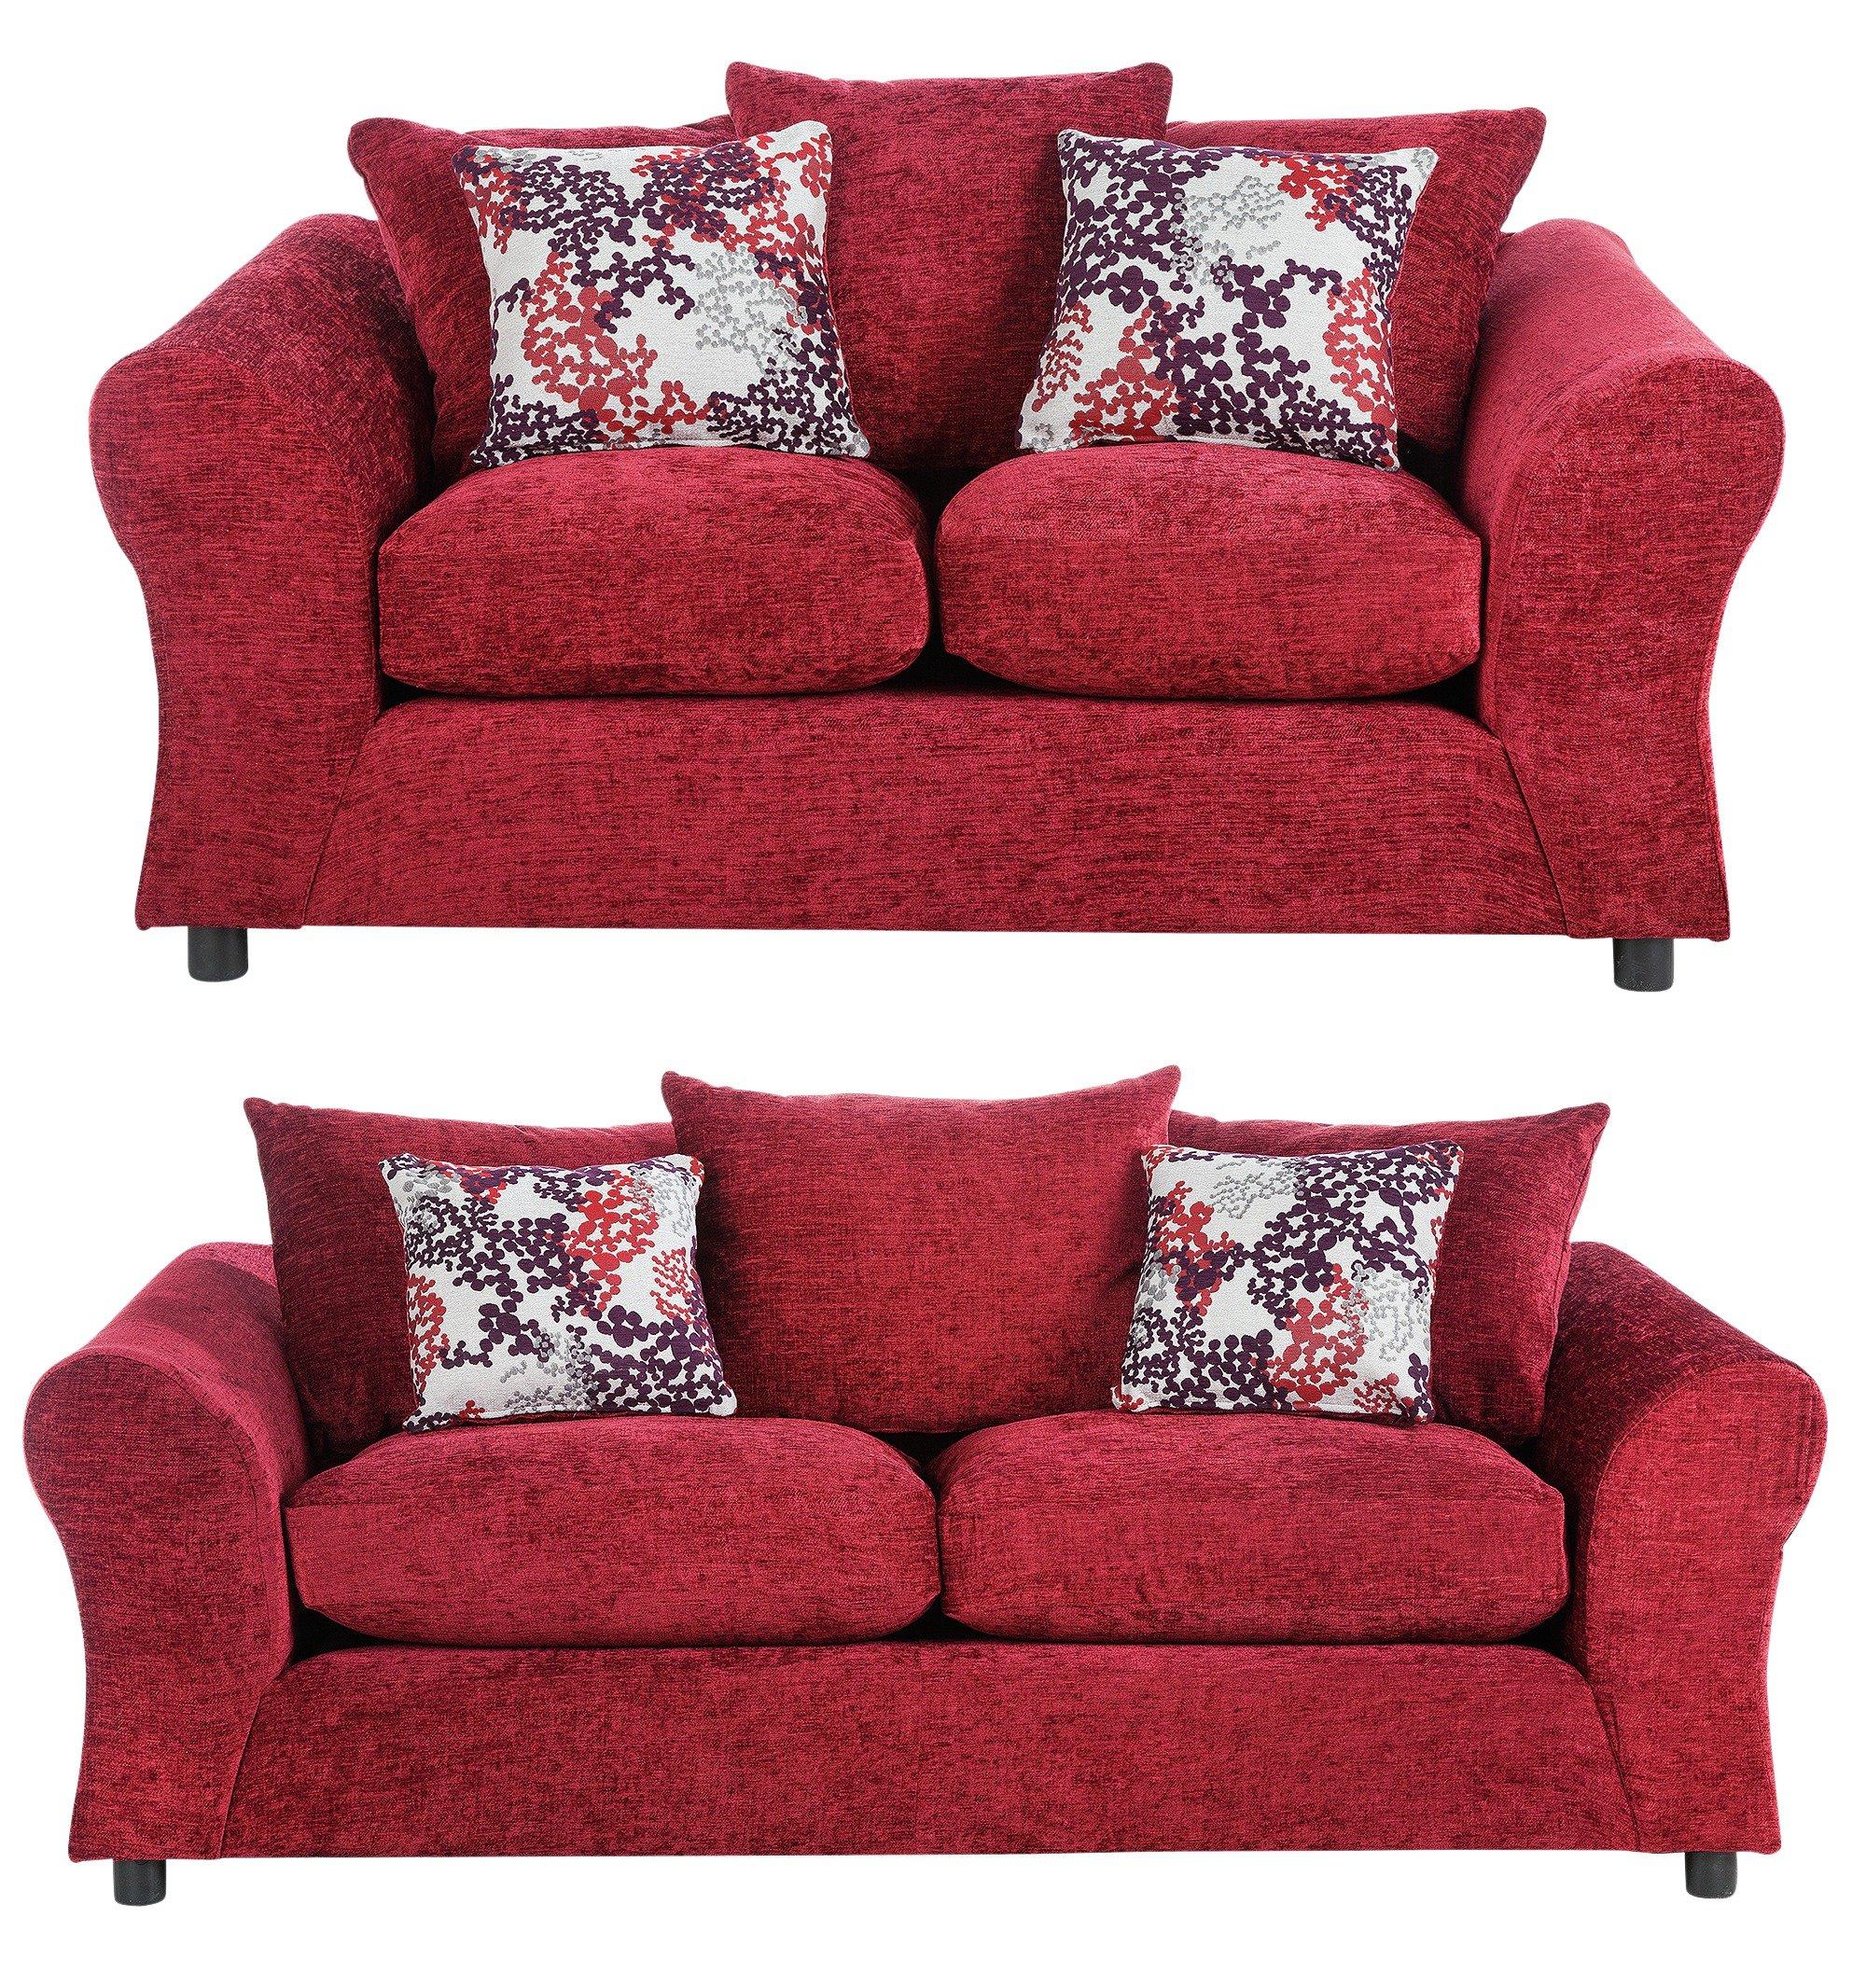 argos home clara fabric 3 seat compact 2 seat sofa red. Black Bedroom Furniture Sets. Home Design Ideas